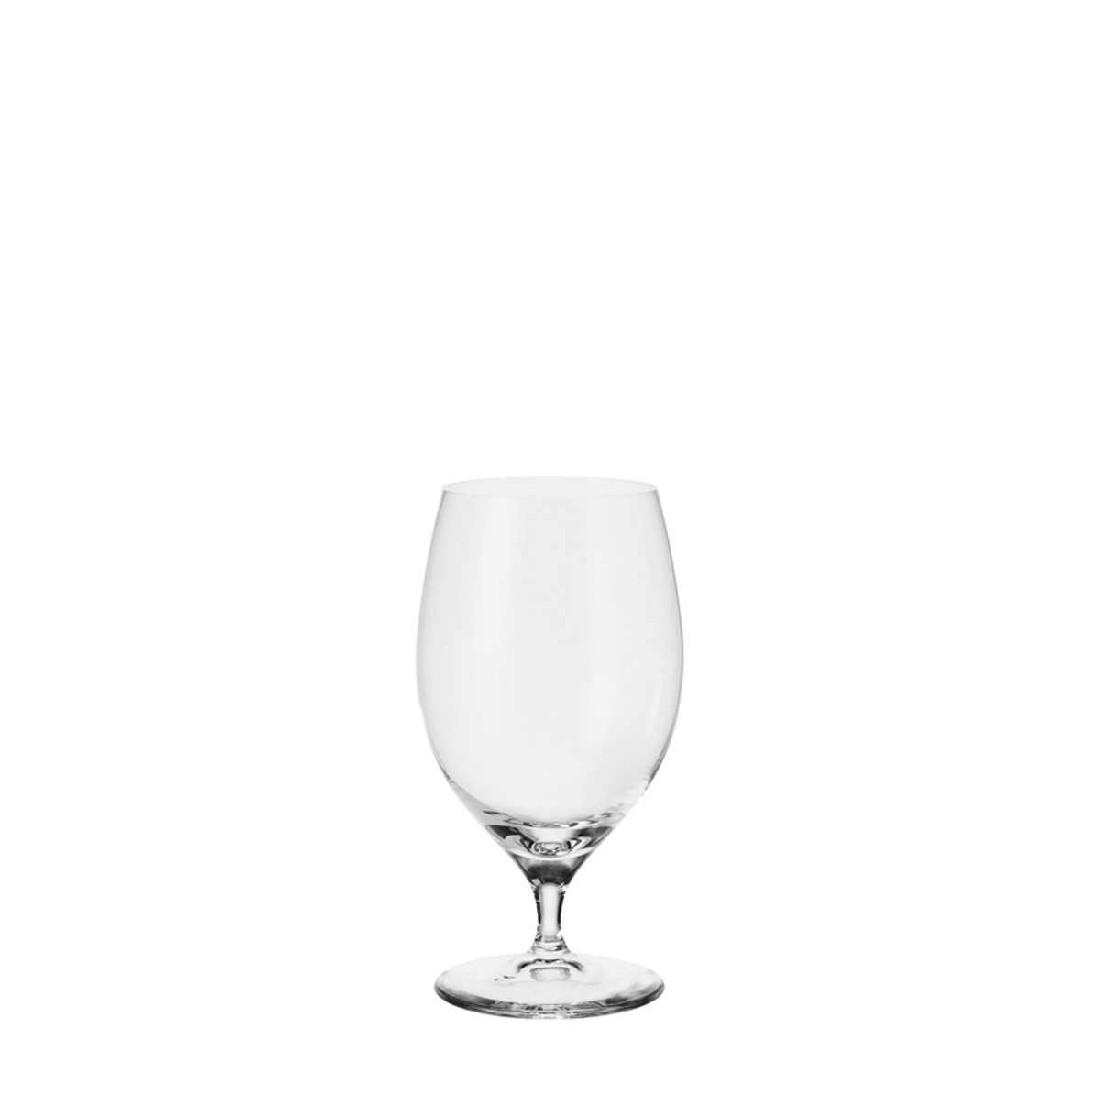 Wasserglas Cheers (6er-Set), Leonardo jetzt bestellen